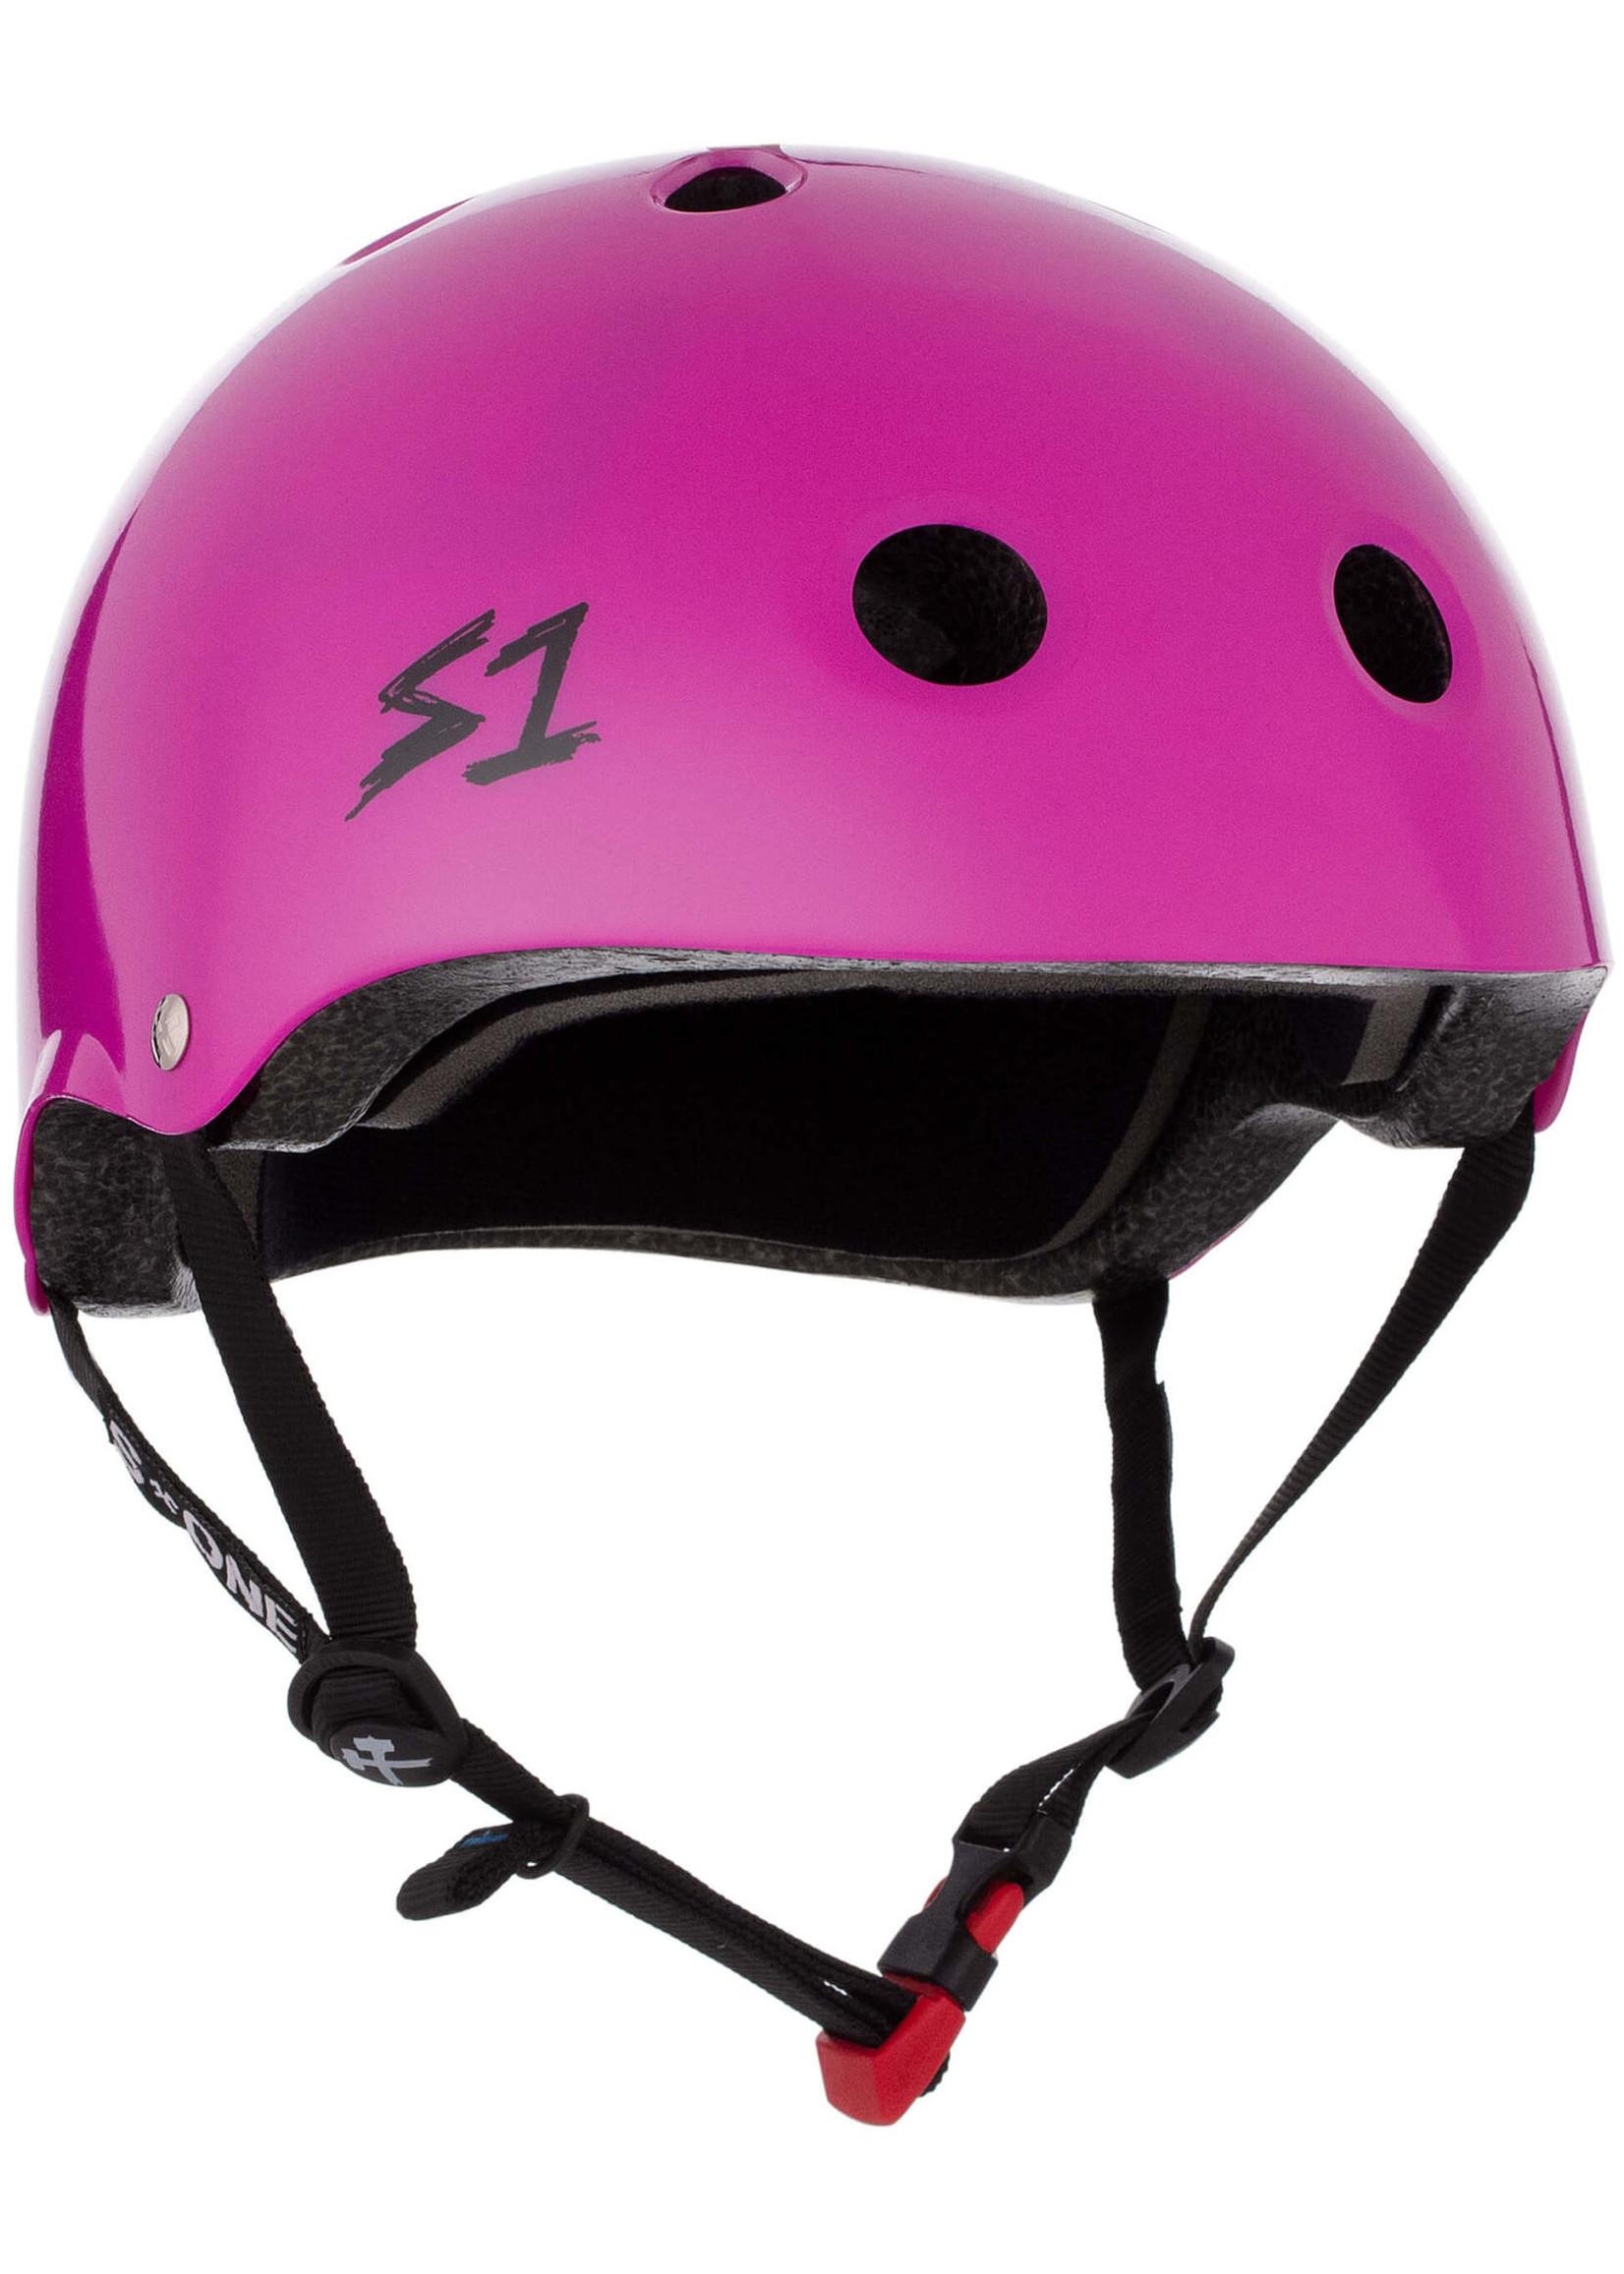 S1 S1 - Lifer Mini - Gloss